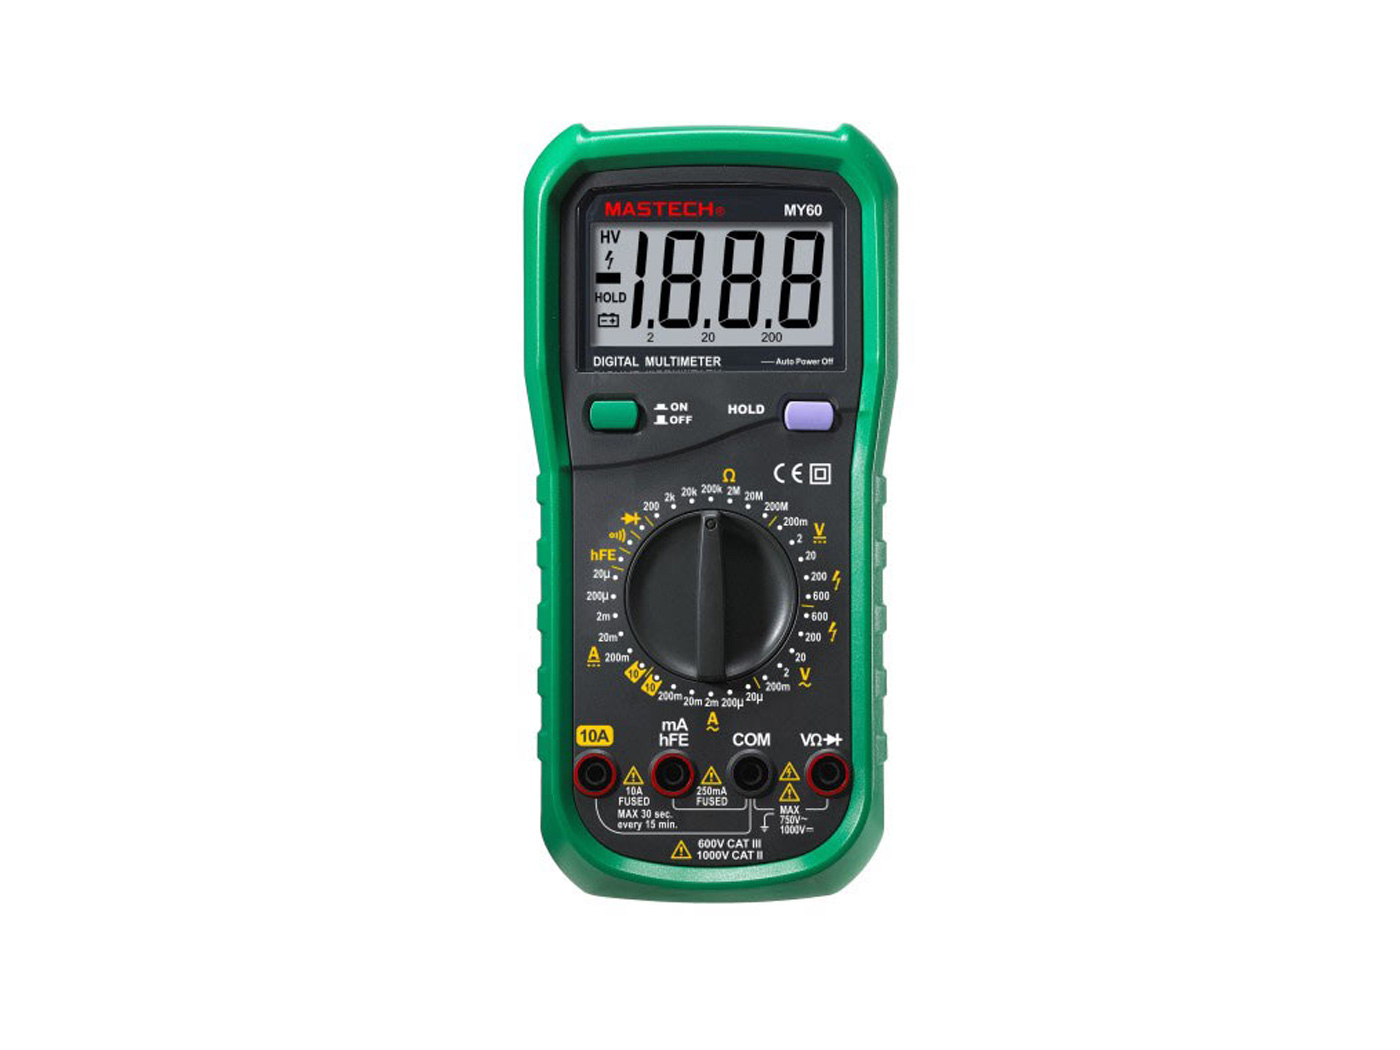 Mastech MY 60 Digital Multimeter